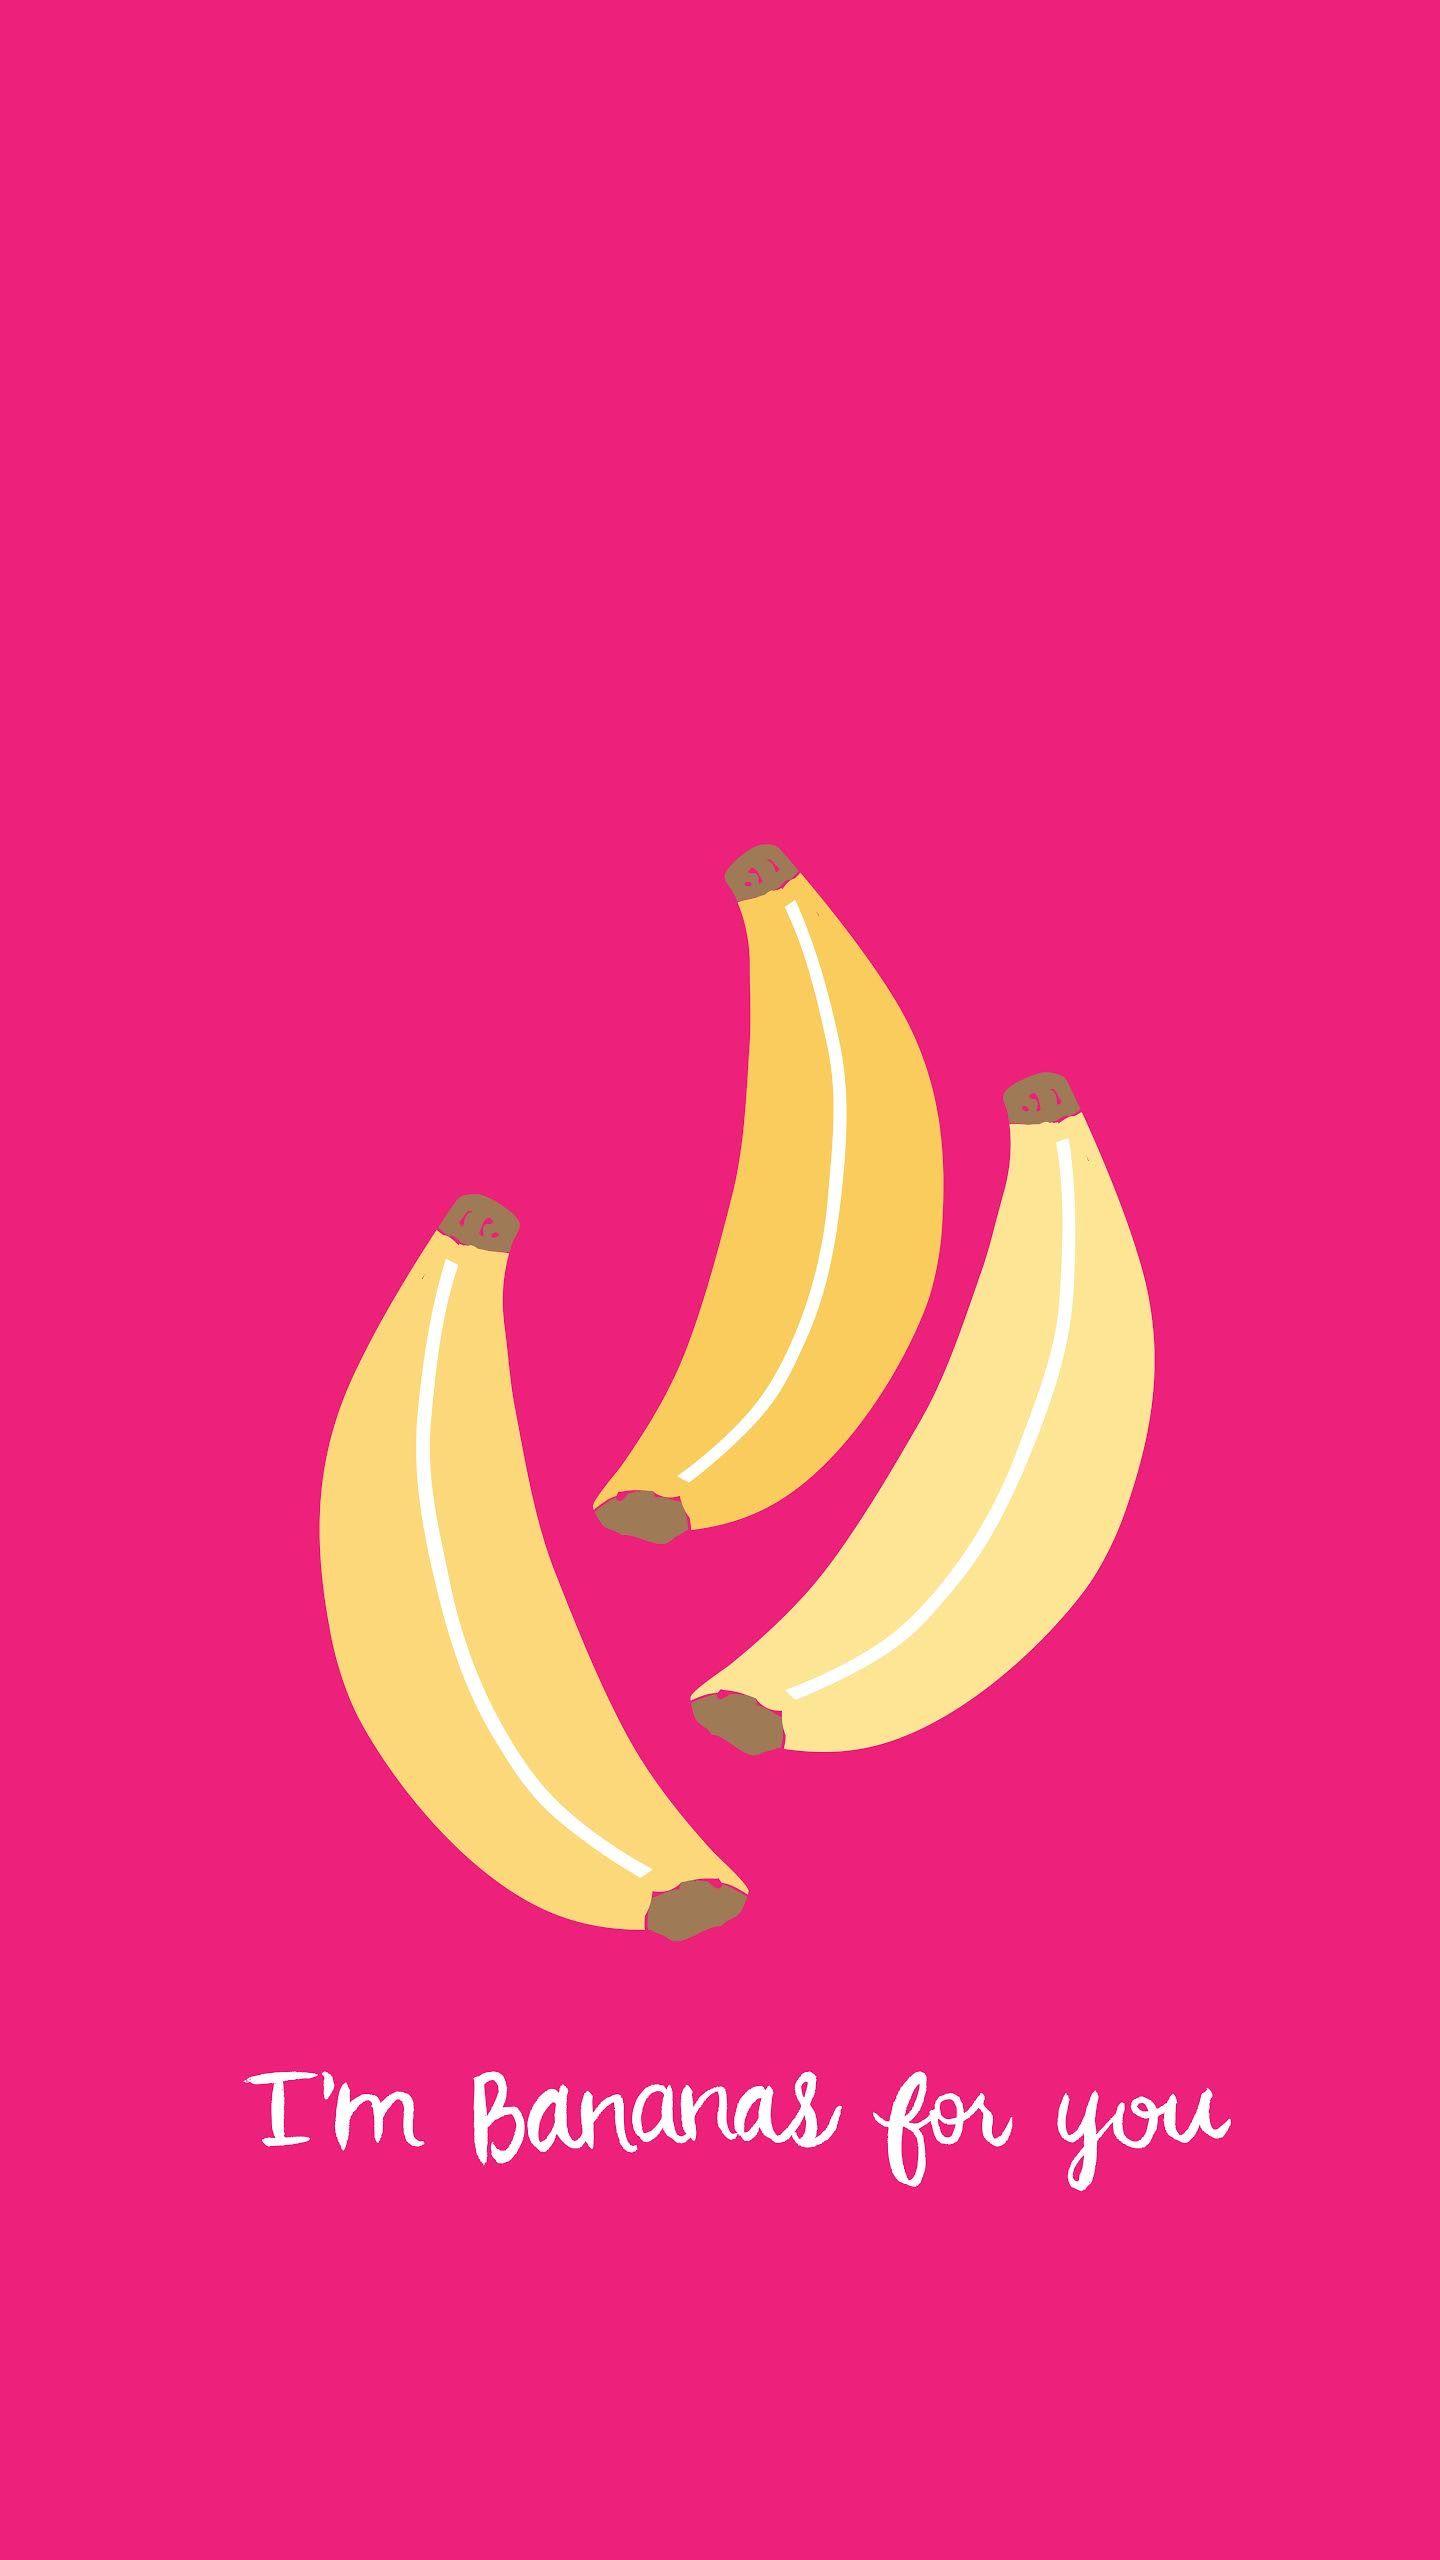 Wallpaper iphone banana - Banana Love Pink Iphone Wallpaper Panpins